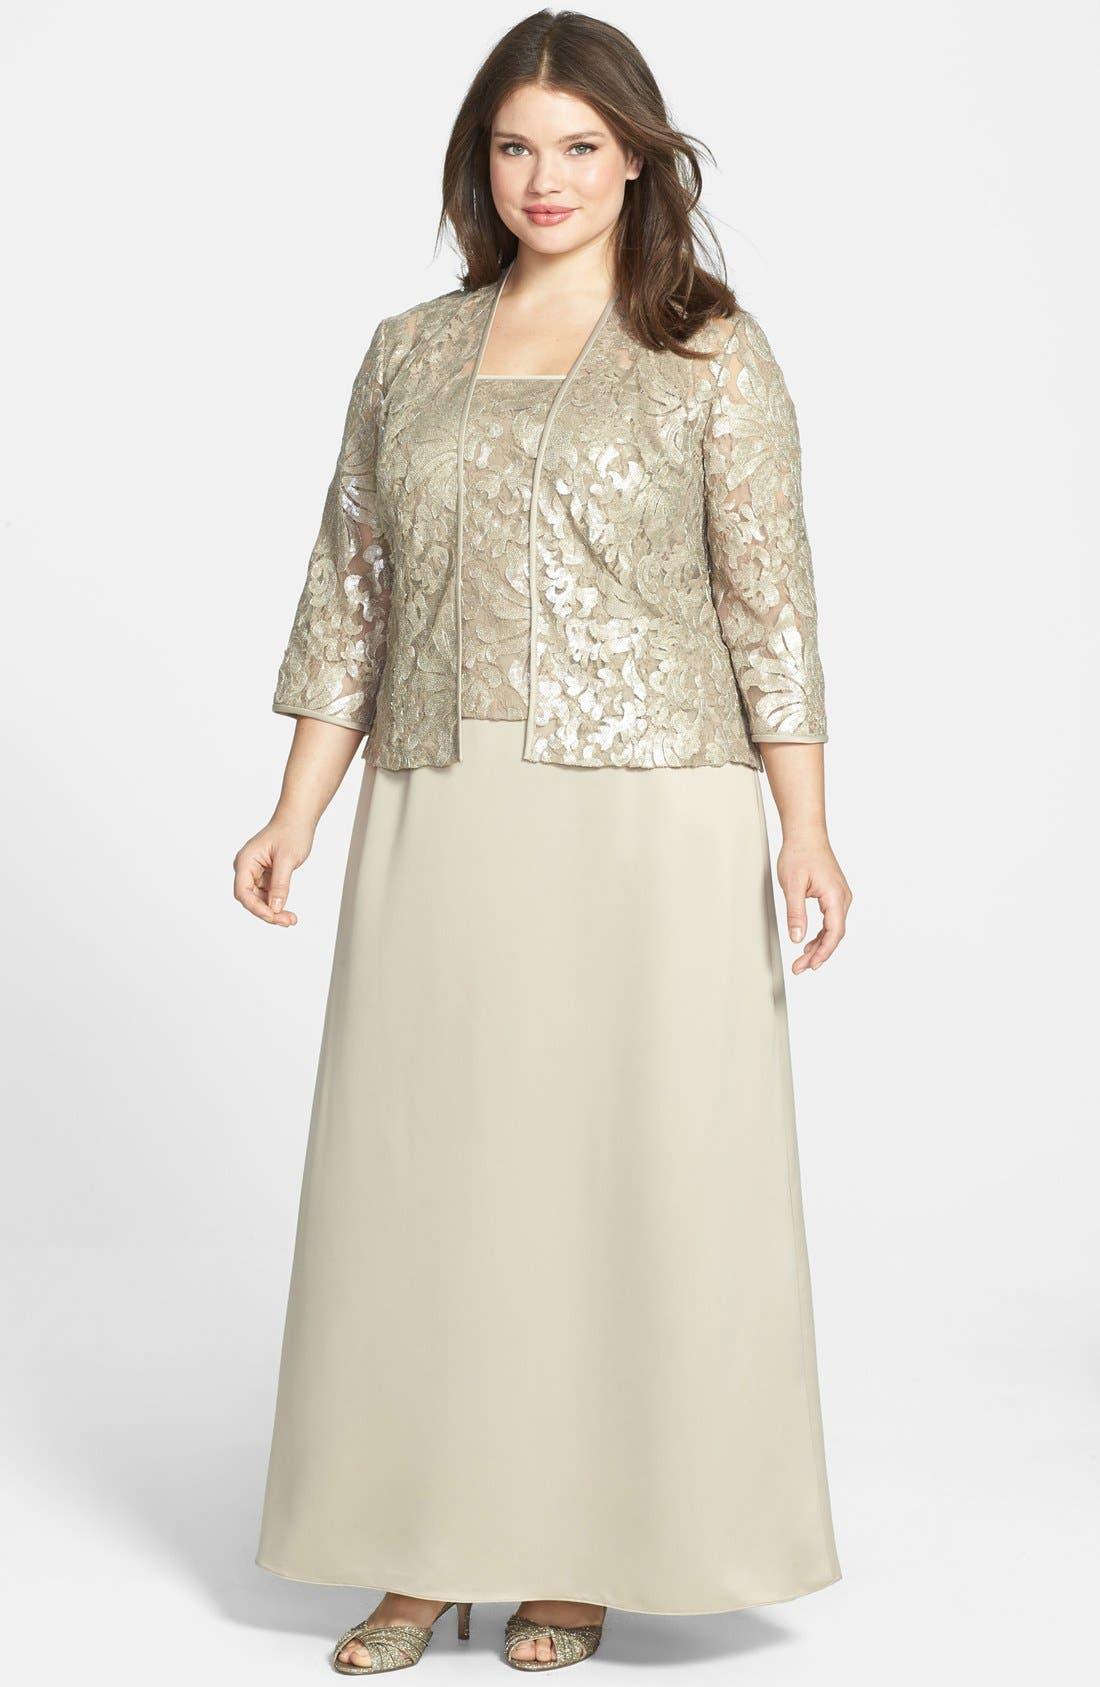 Main Image - Alex Evenings Embellished Chiffon Gown & Jacket (Plus Size)